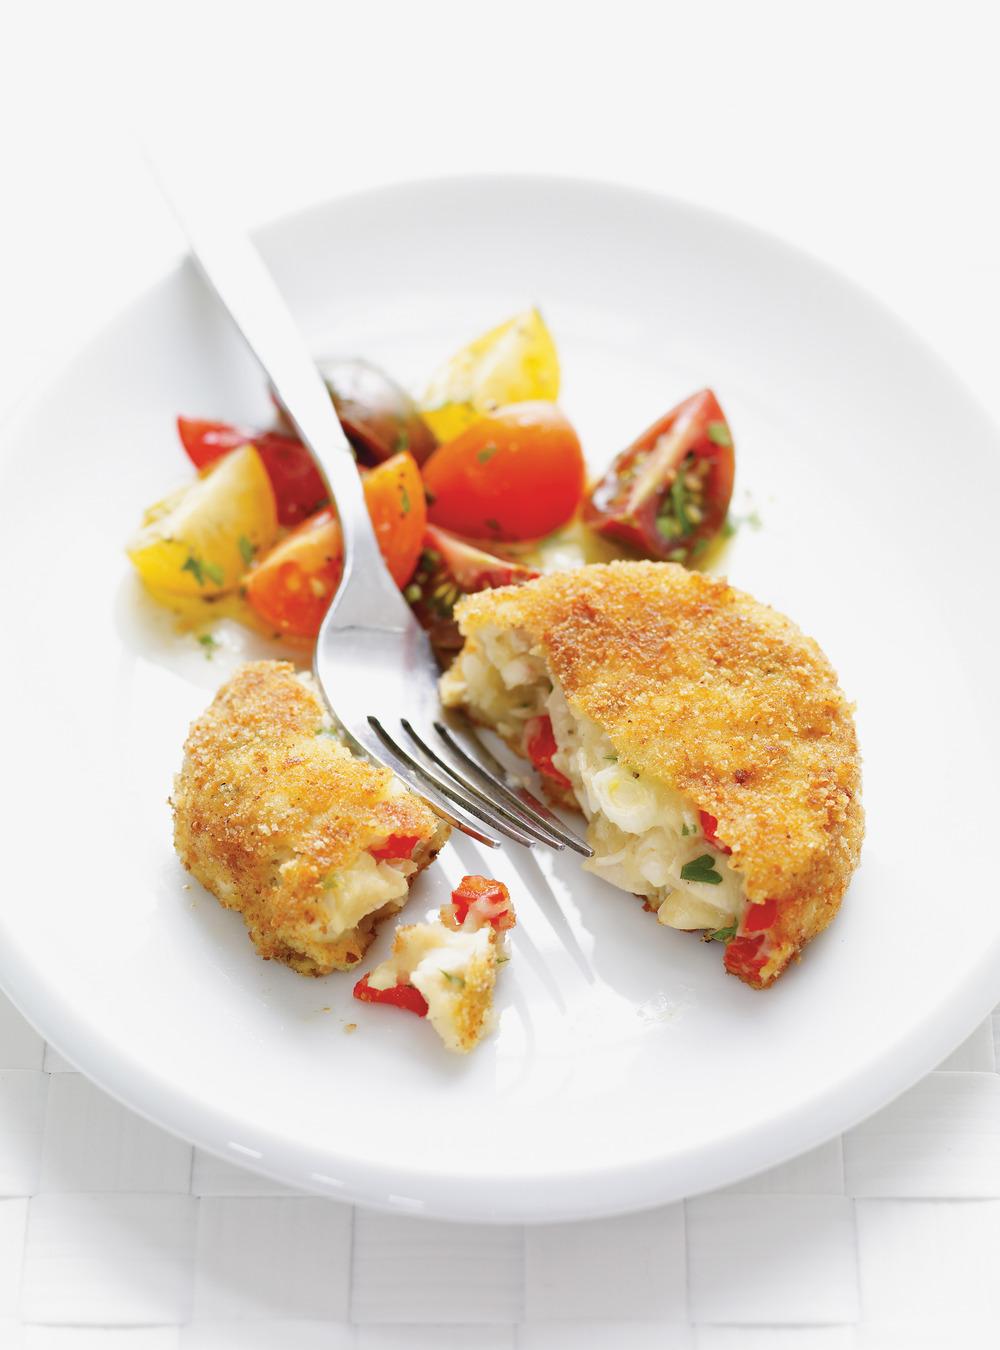 Croquettes de poulet ricardo for Cuisine ricardo